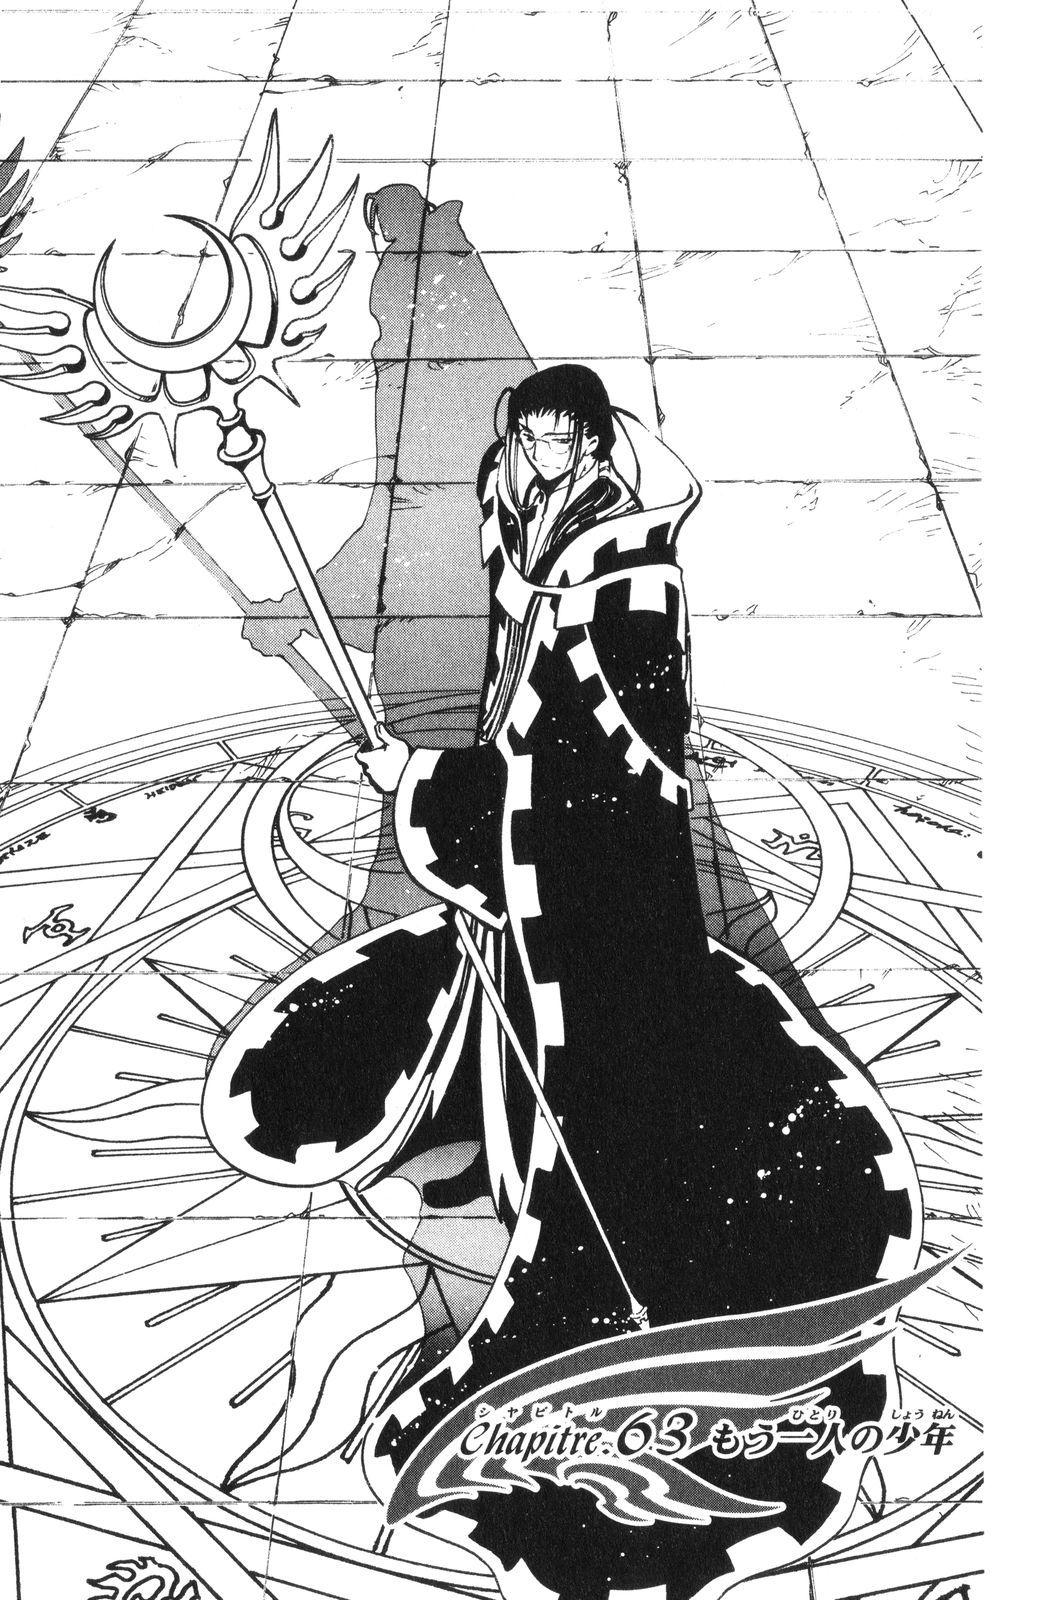 Yaoi xxx sakura captor card comic